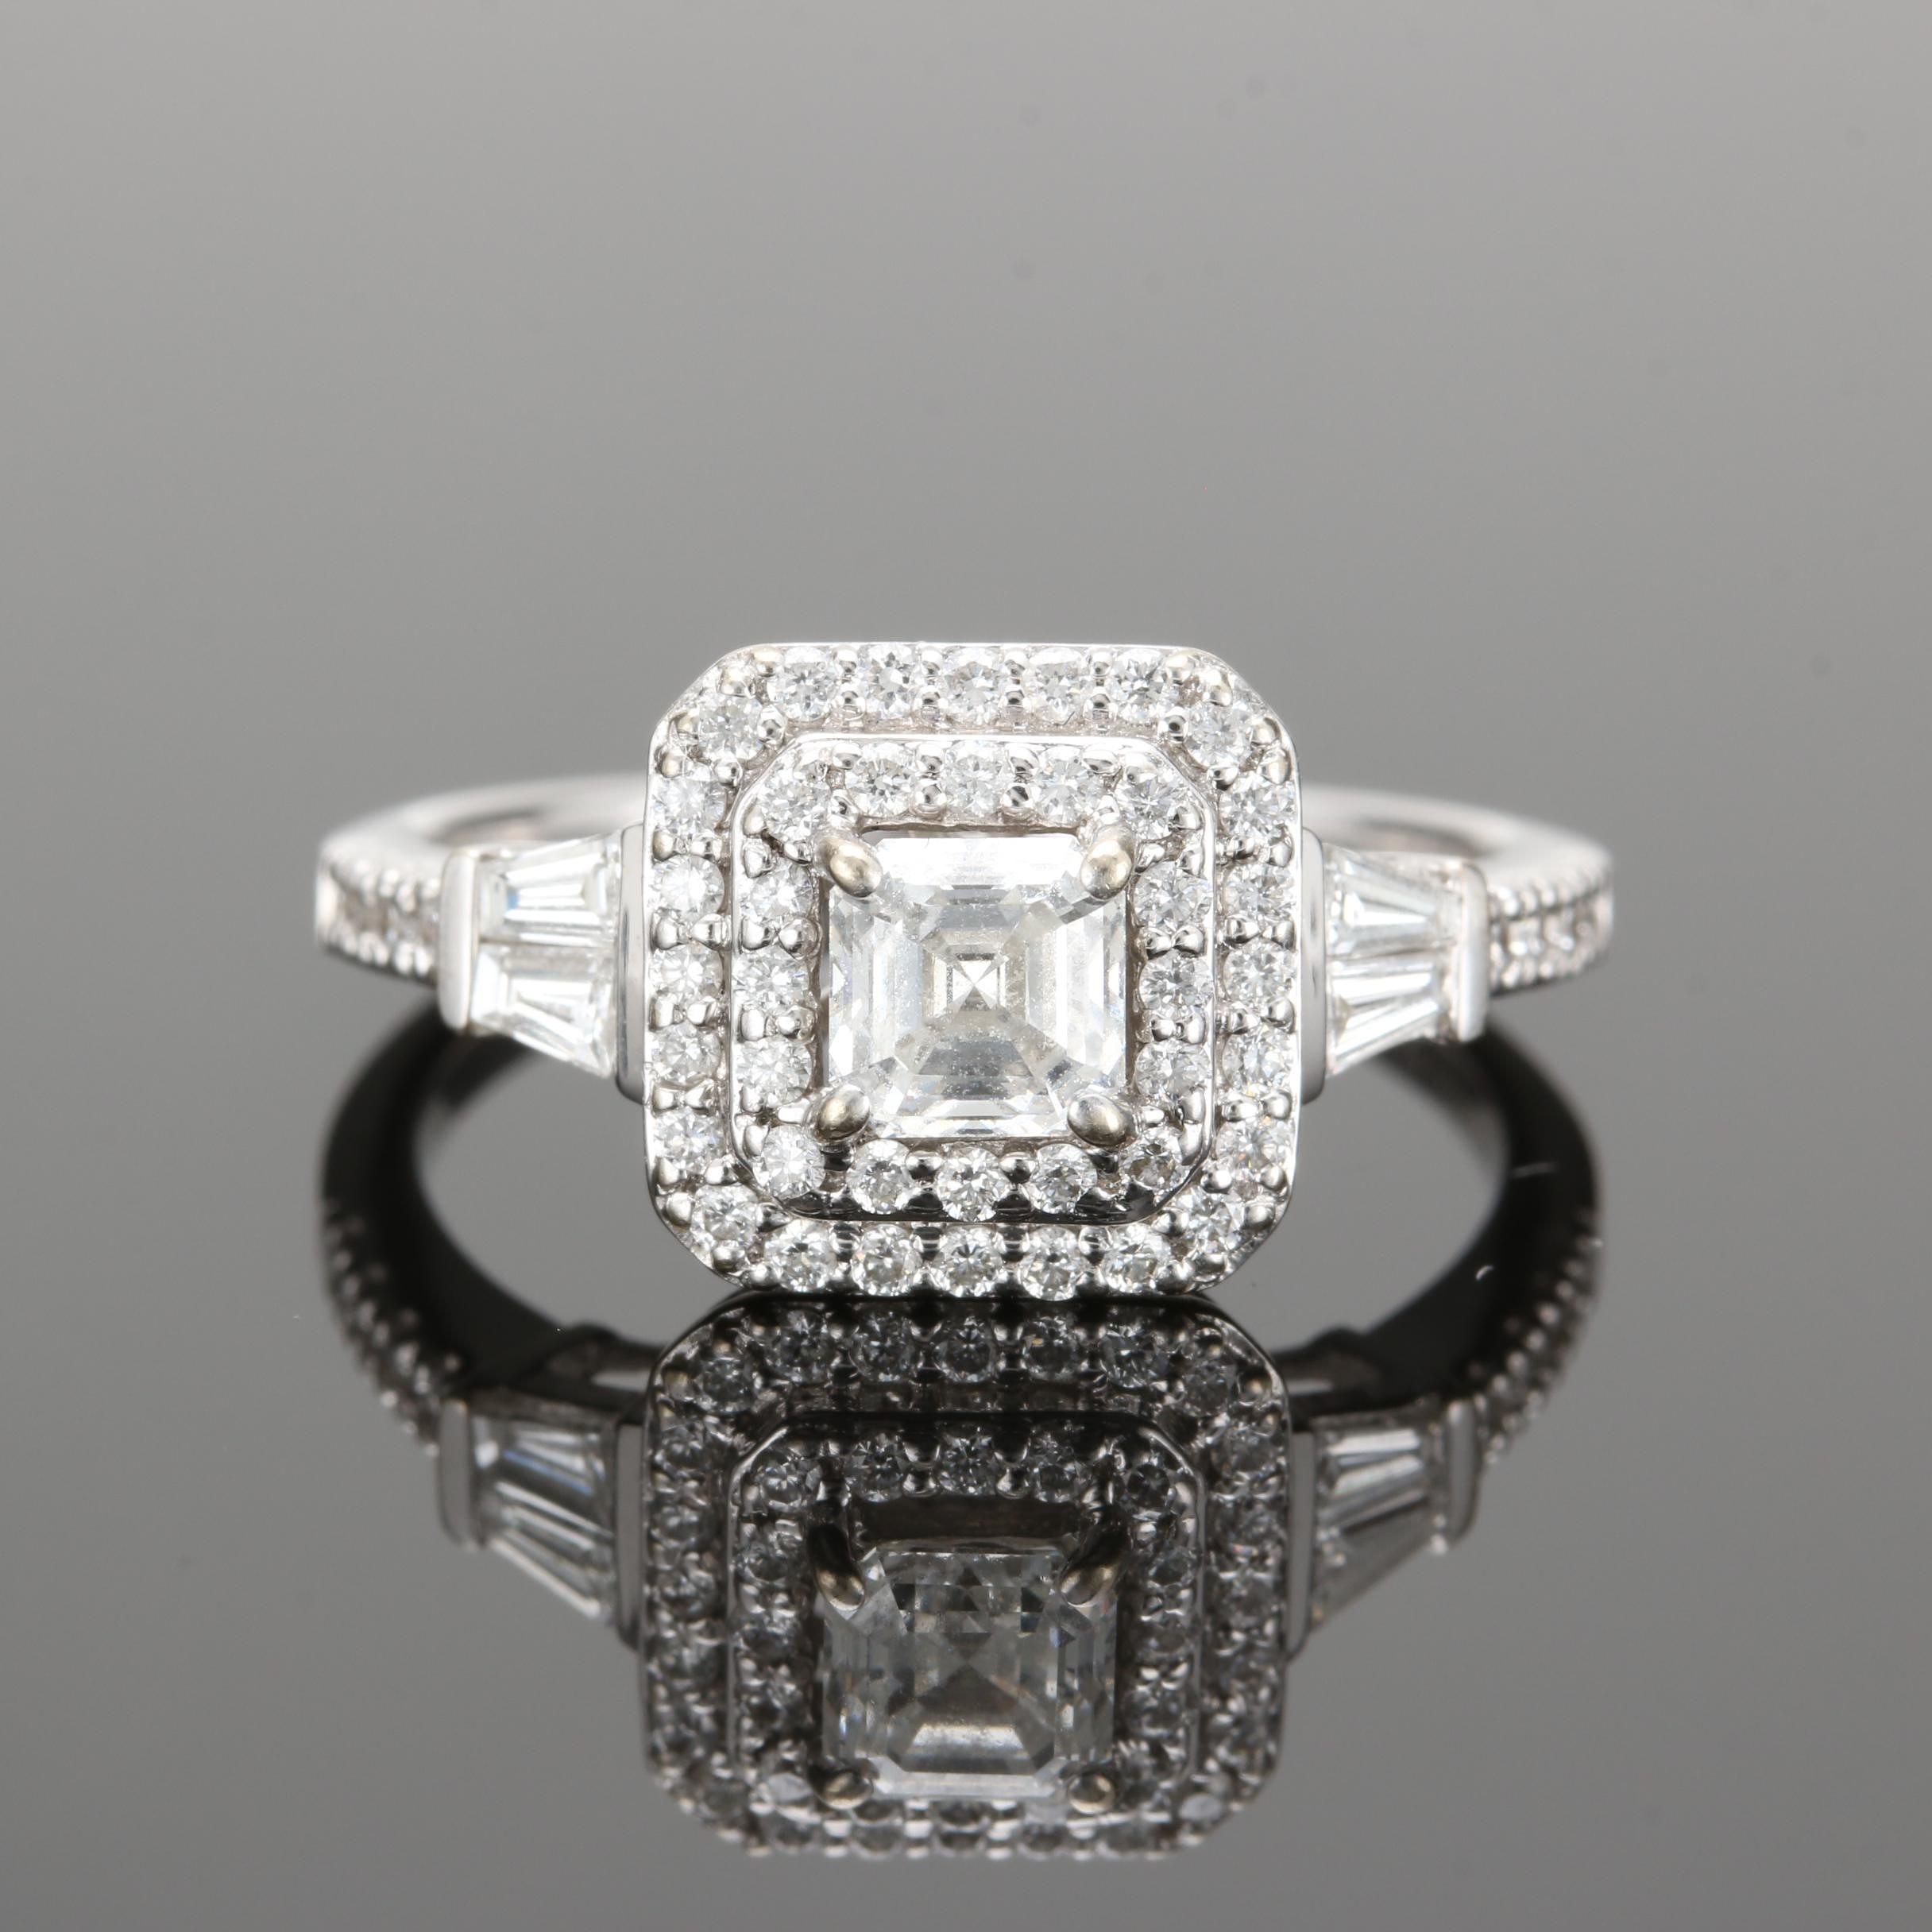 18K White Gold 1.00 CTW Diamond Ring